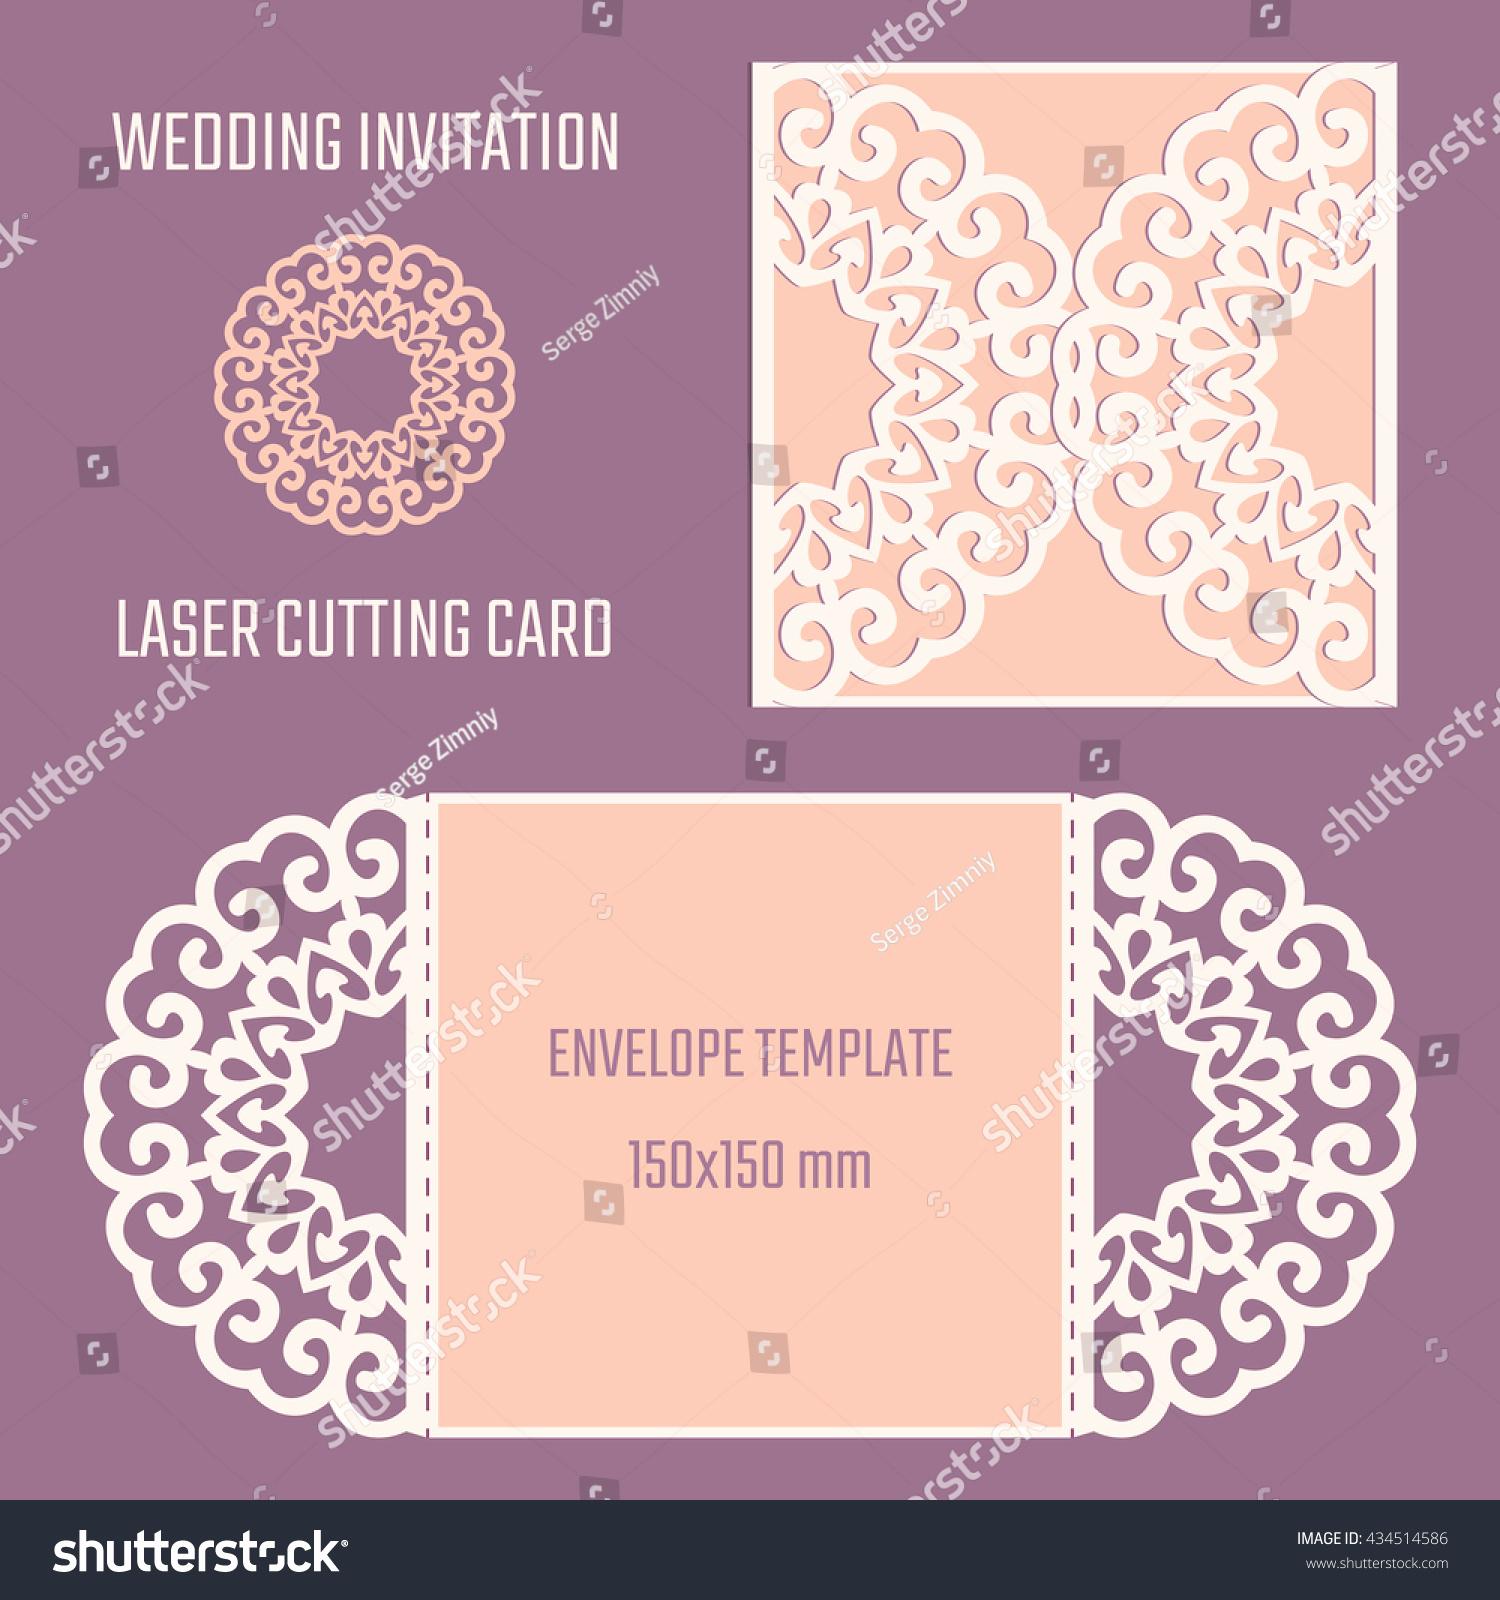 Wedding Invitation Envelope Template Best Of Diy Laser Cutting Vector Envelope Wedding Stock Vector